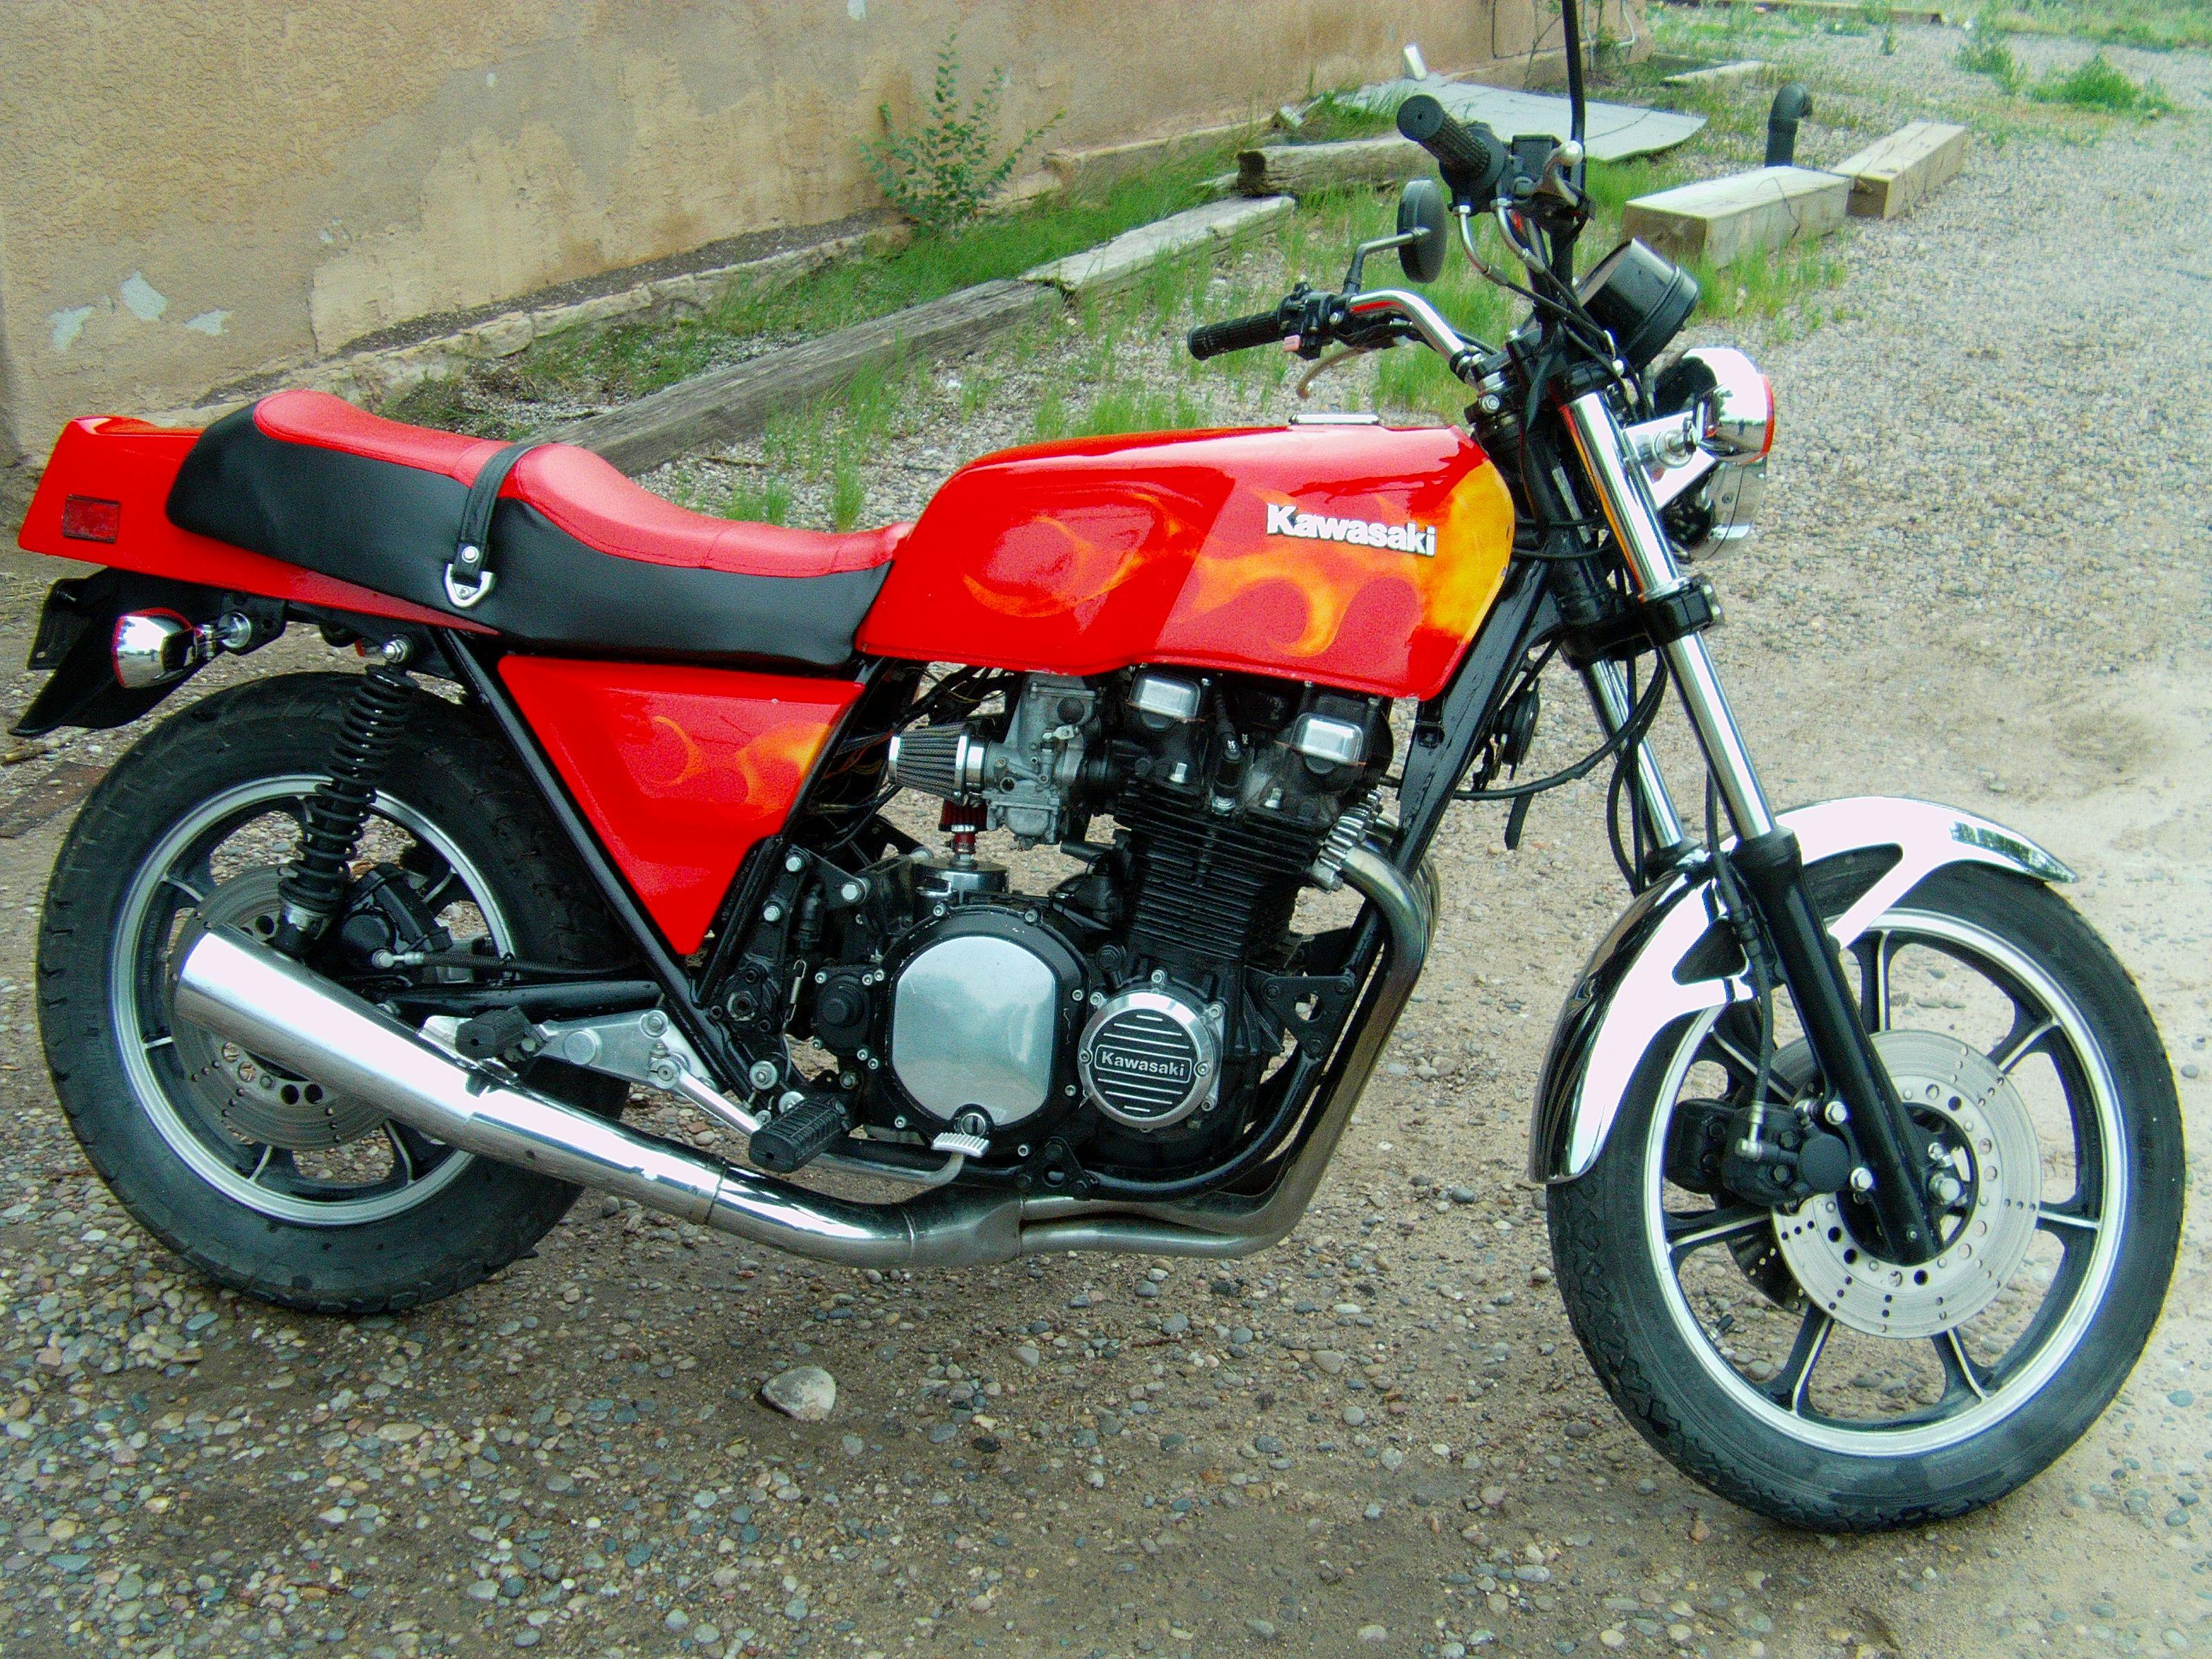 980 Kawasaki KZ1000 Shaft Drive with engine mods  One of my